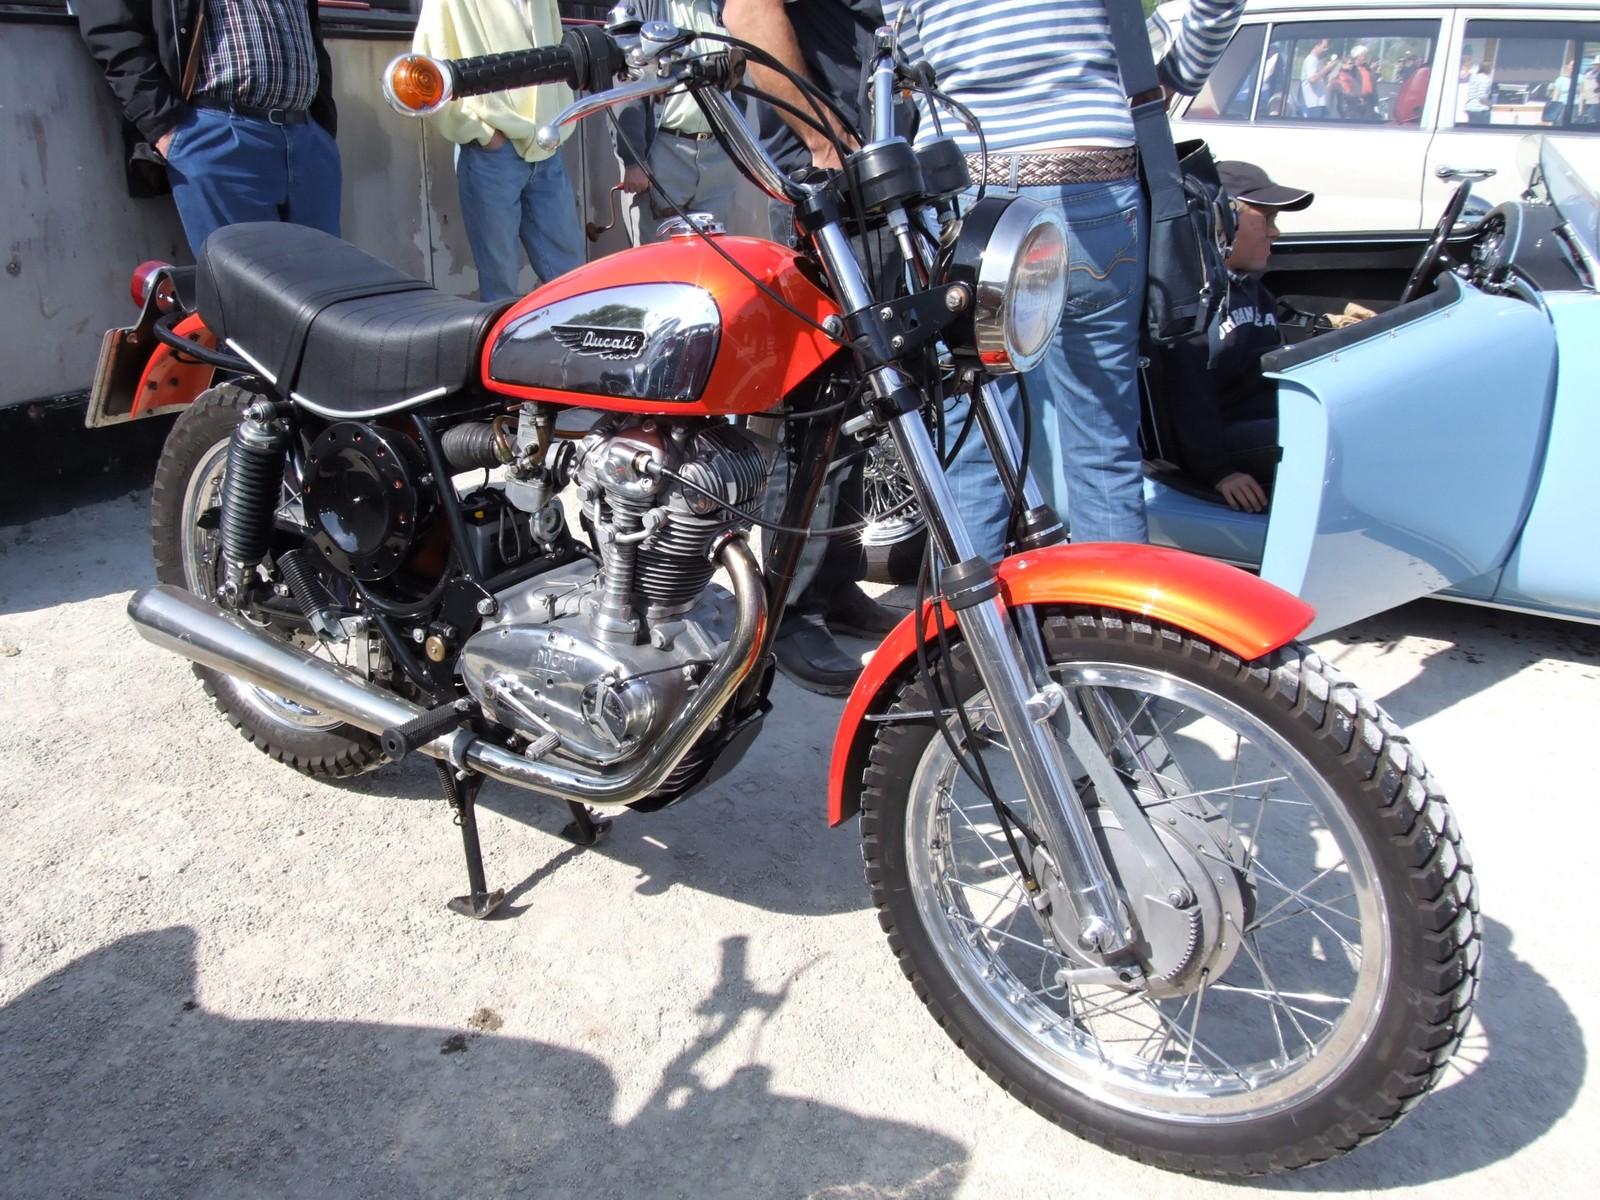 Ducati Scrambler Cafe Racer First Ride